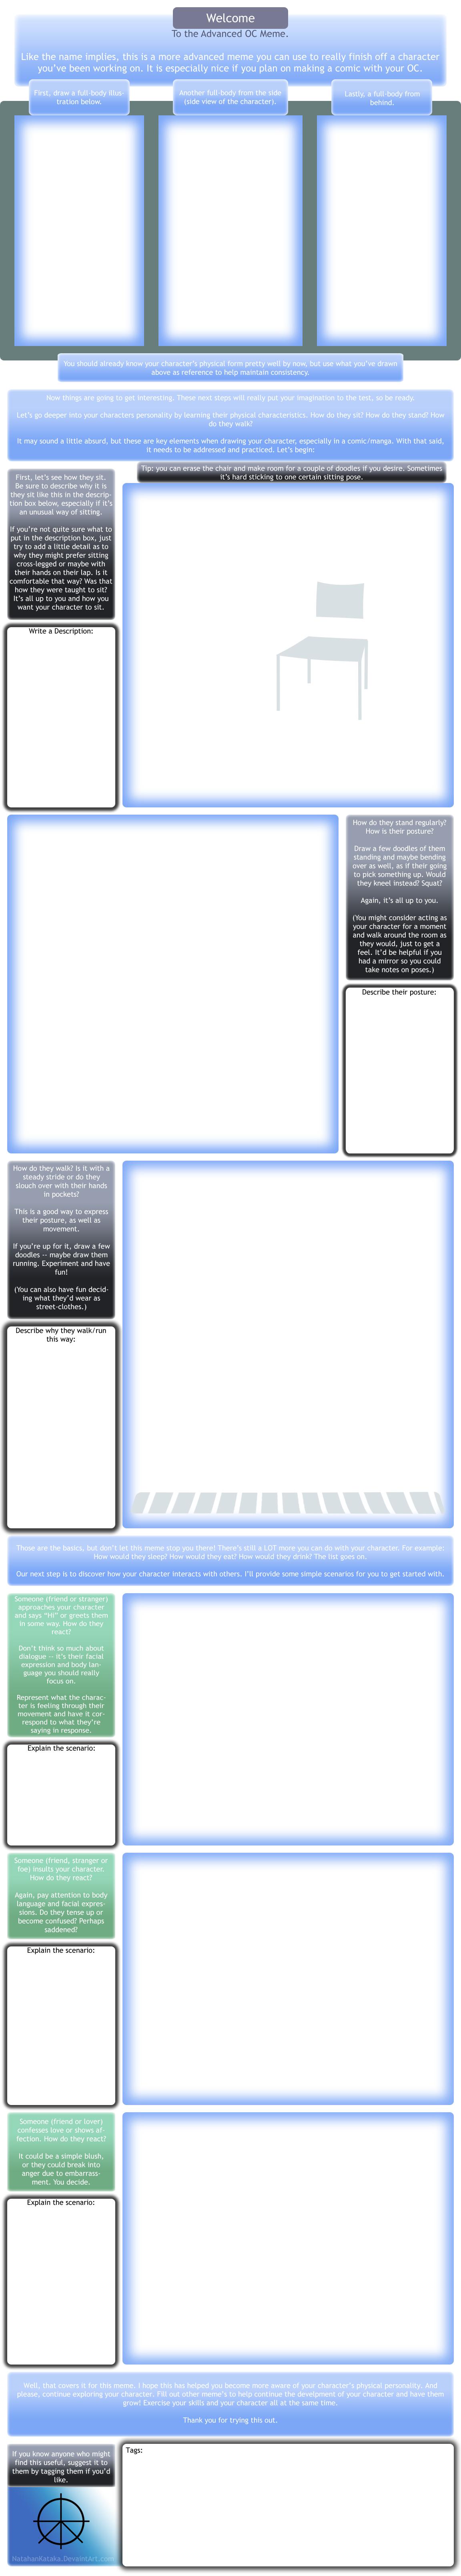 Advanced OC Meme - Blank by NatahanStudios